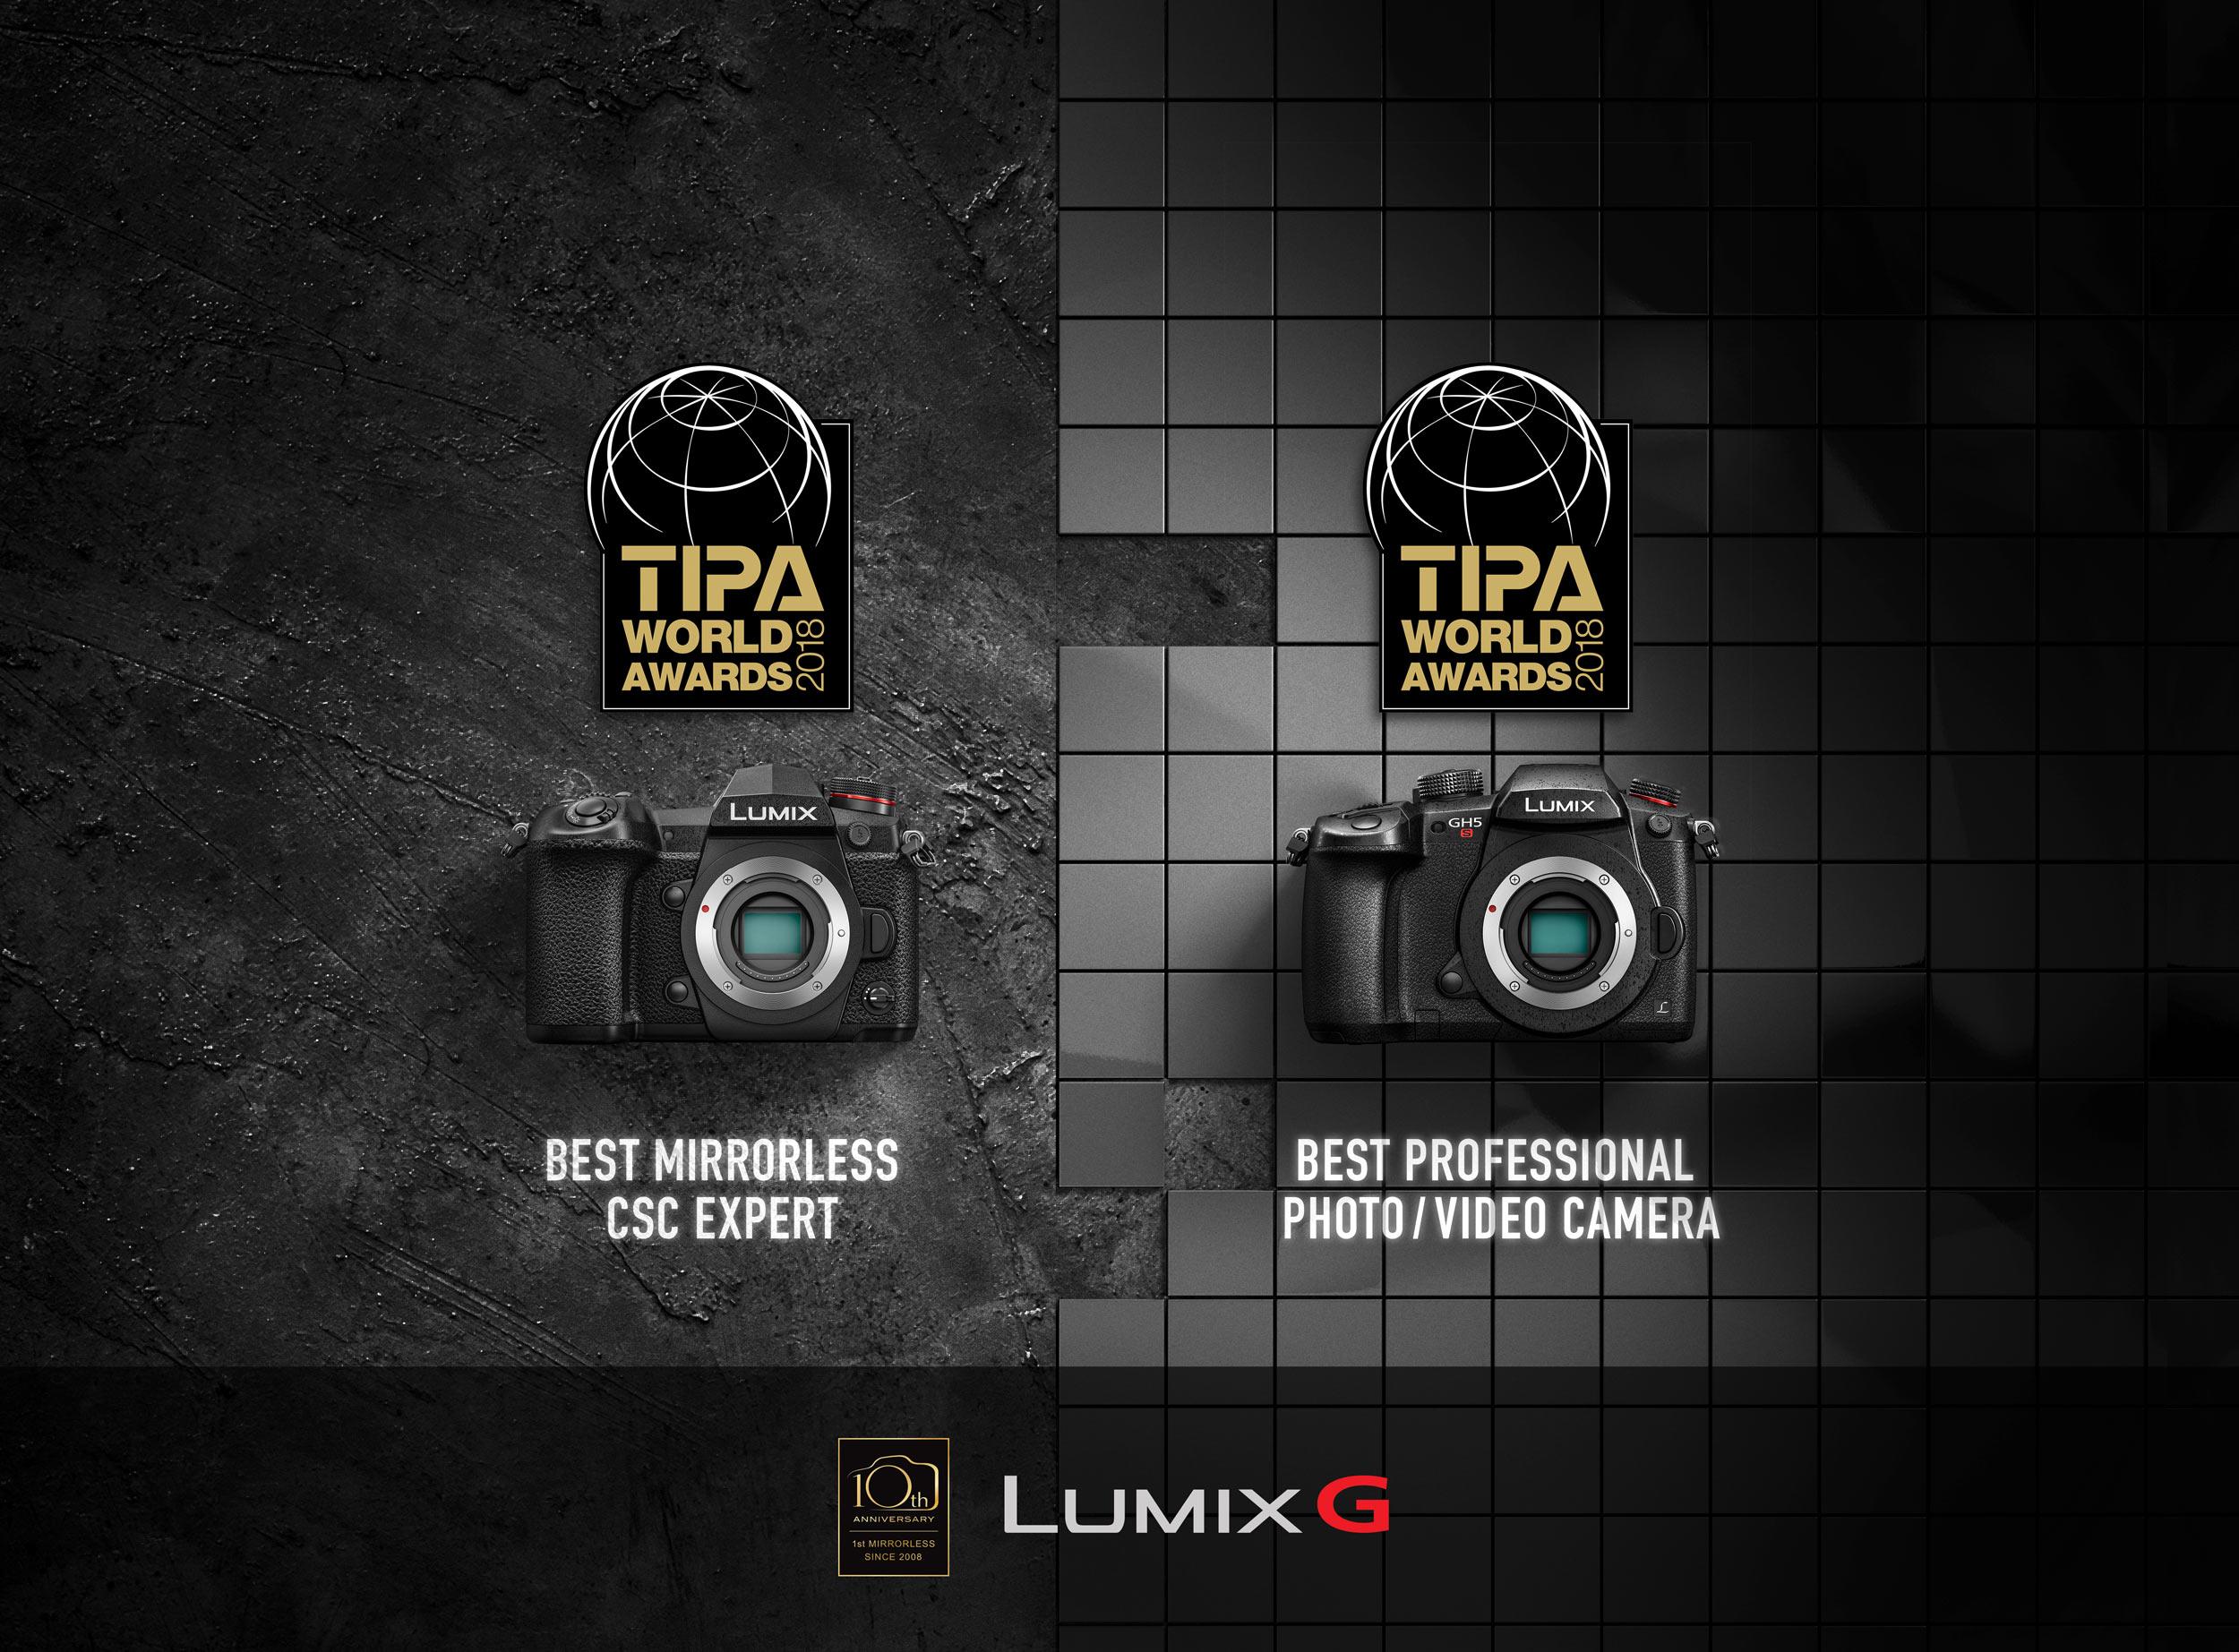 Camerele foto Panasonic premiate la TIPA Awards 2018